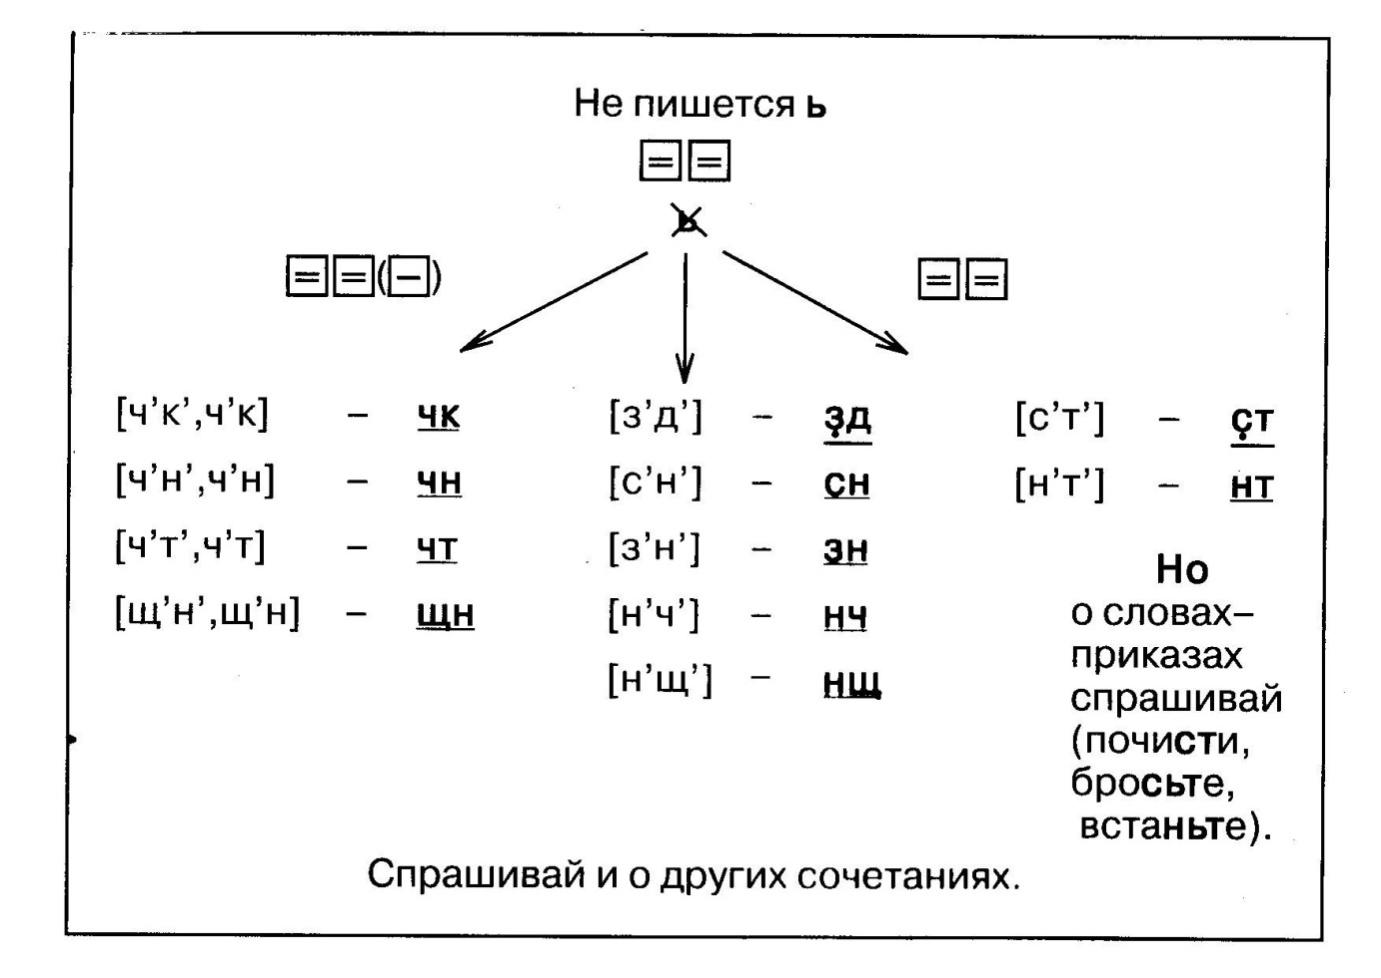 C:\Users\Митрофанушка\Pictures\2010-10-22\002.jpg